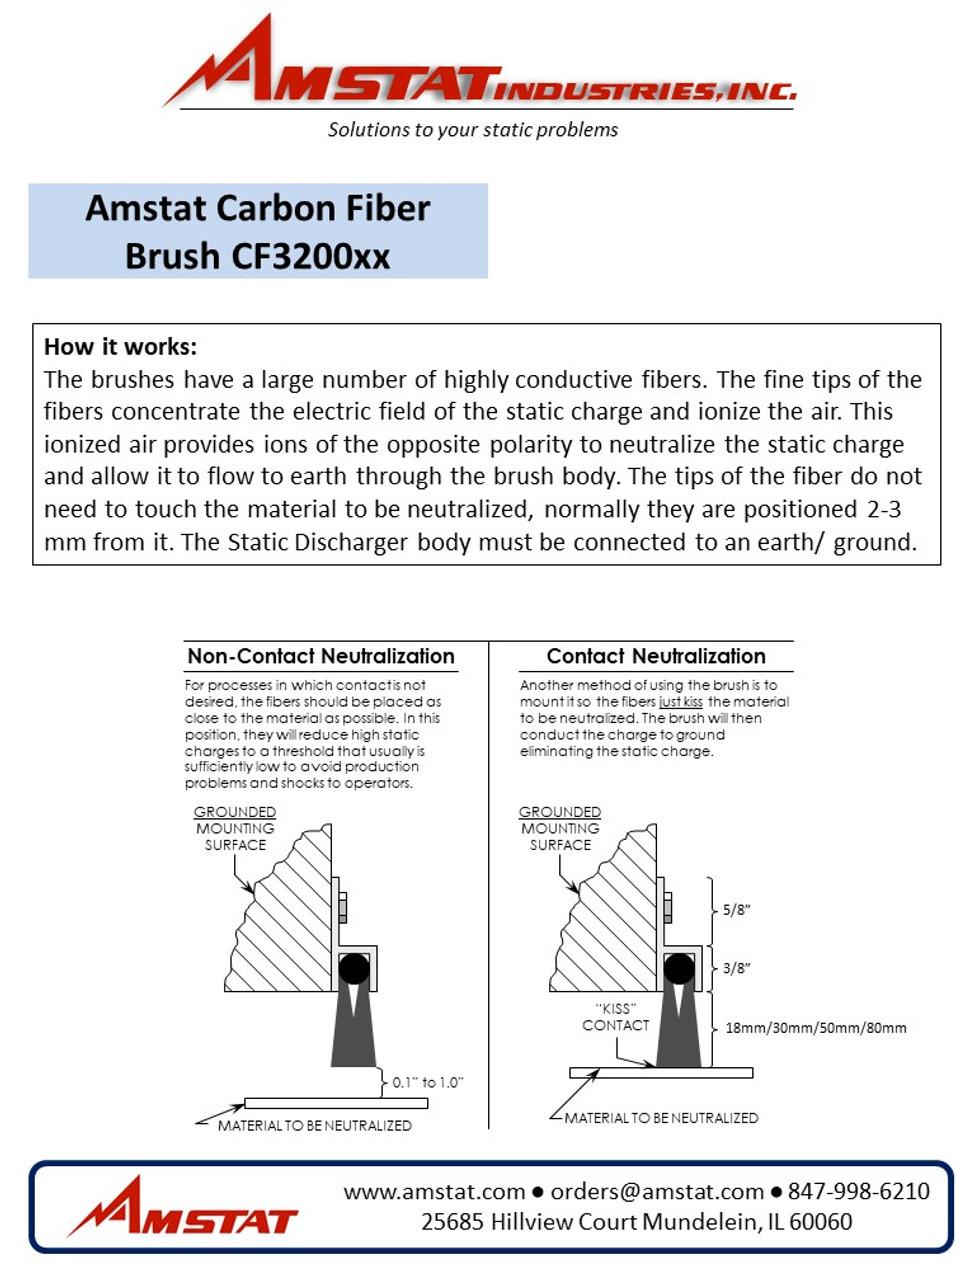 Carbon Fiber Brushes (18mm bristles) - $6.00/inch